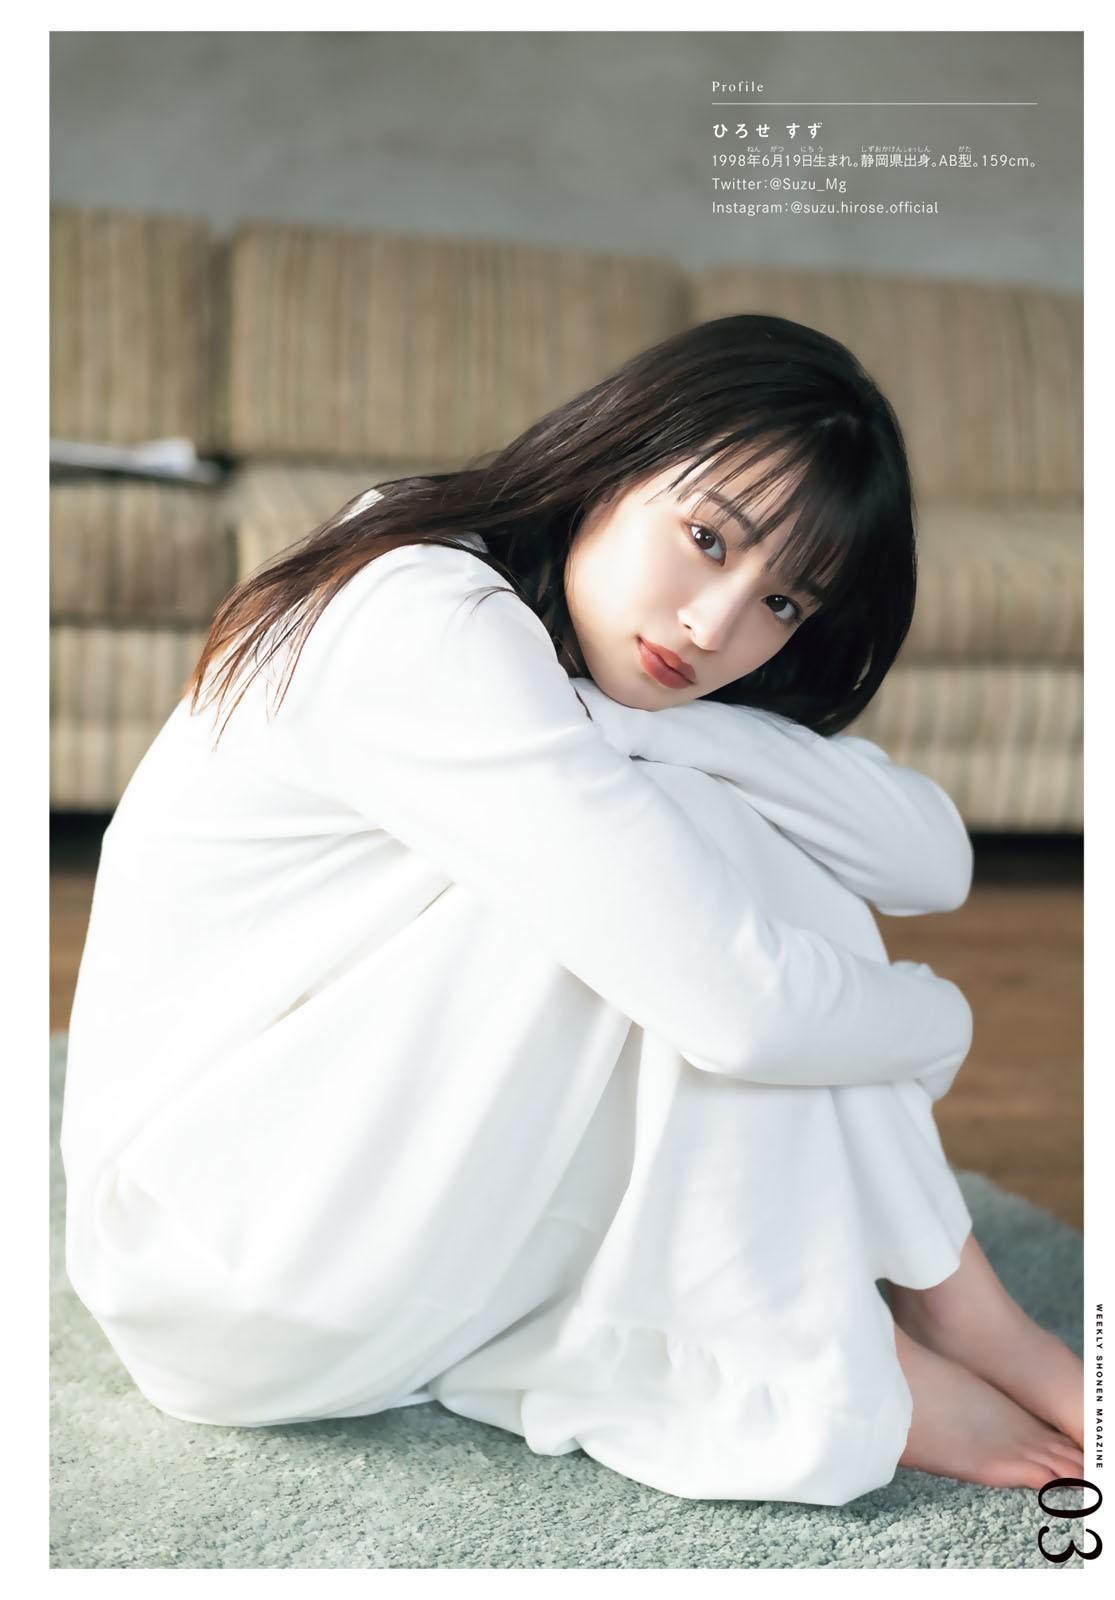 广濑丝丝 少年Magazine